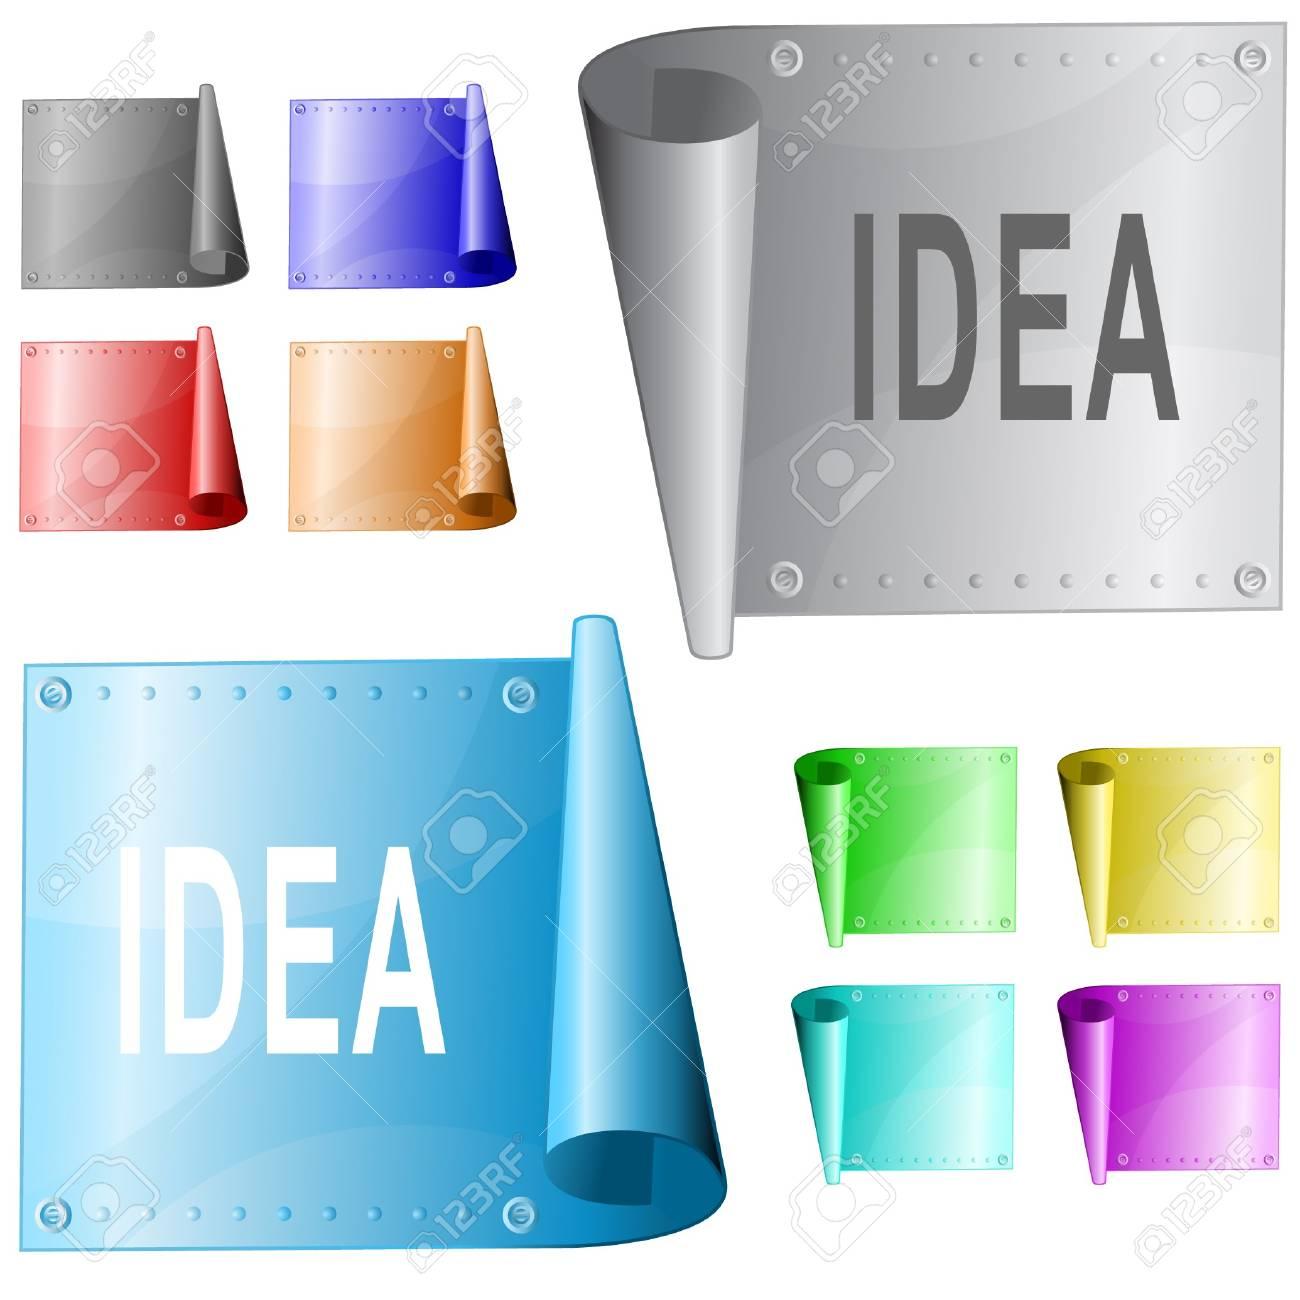 Idea.  metal surface. Stock Vector - 6863010